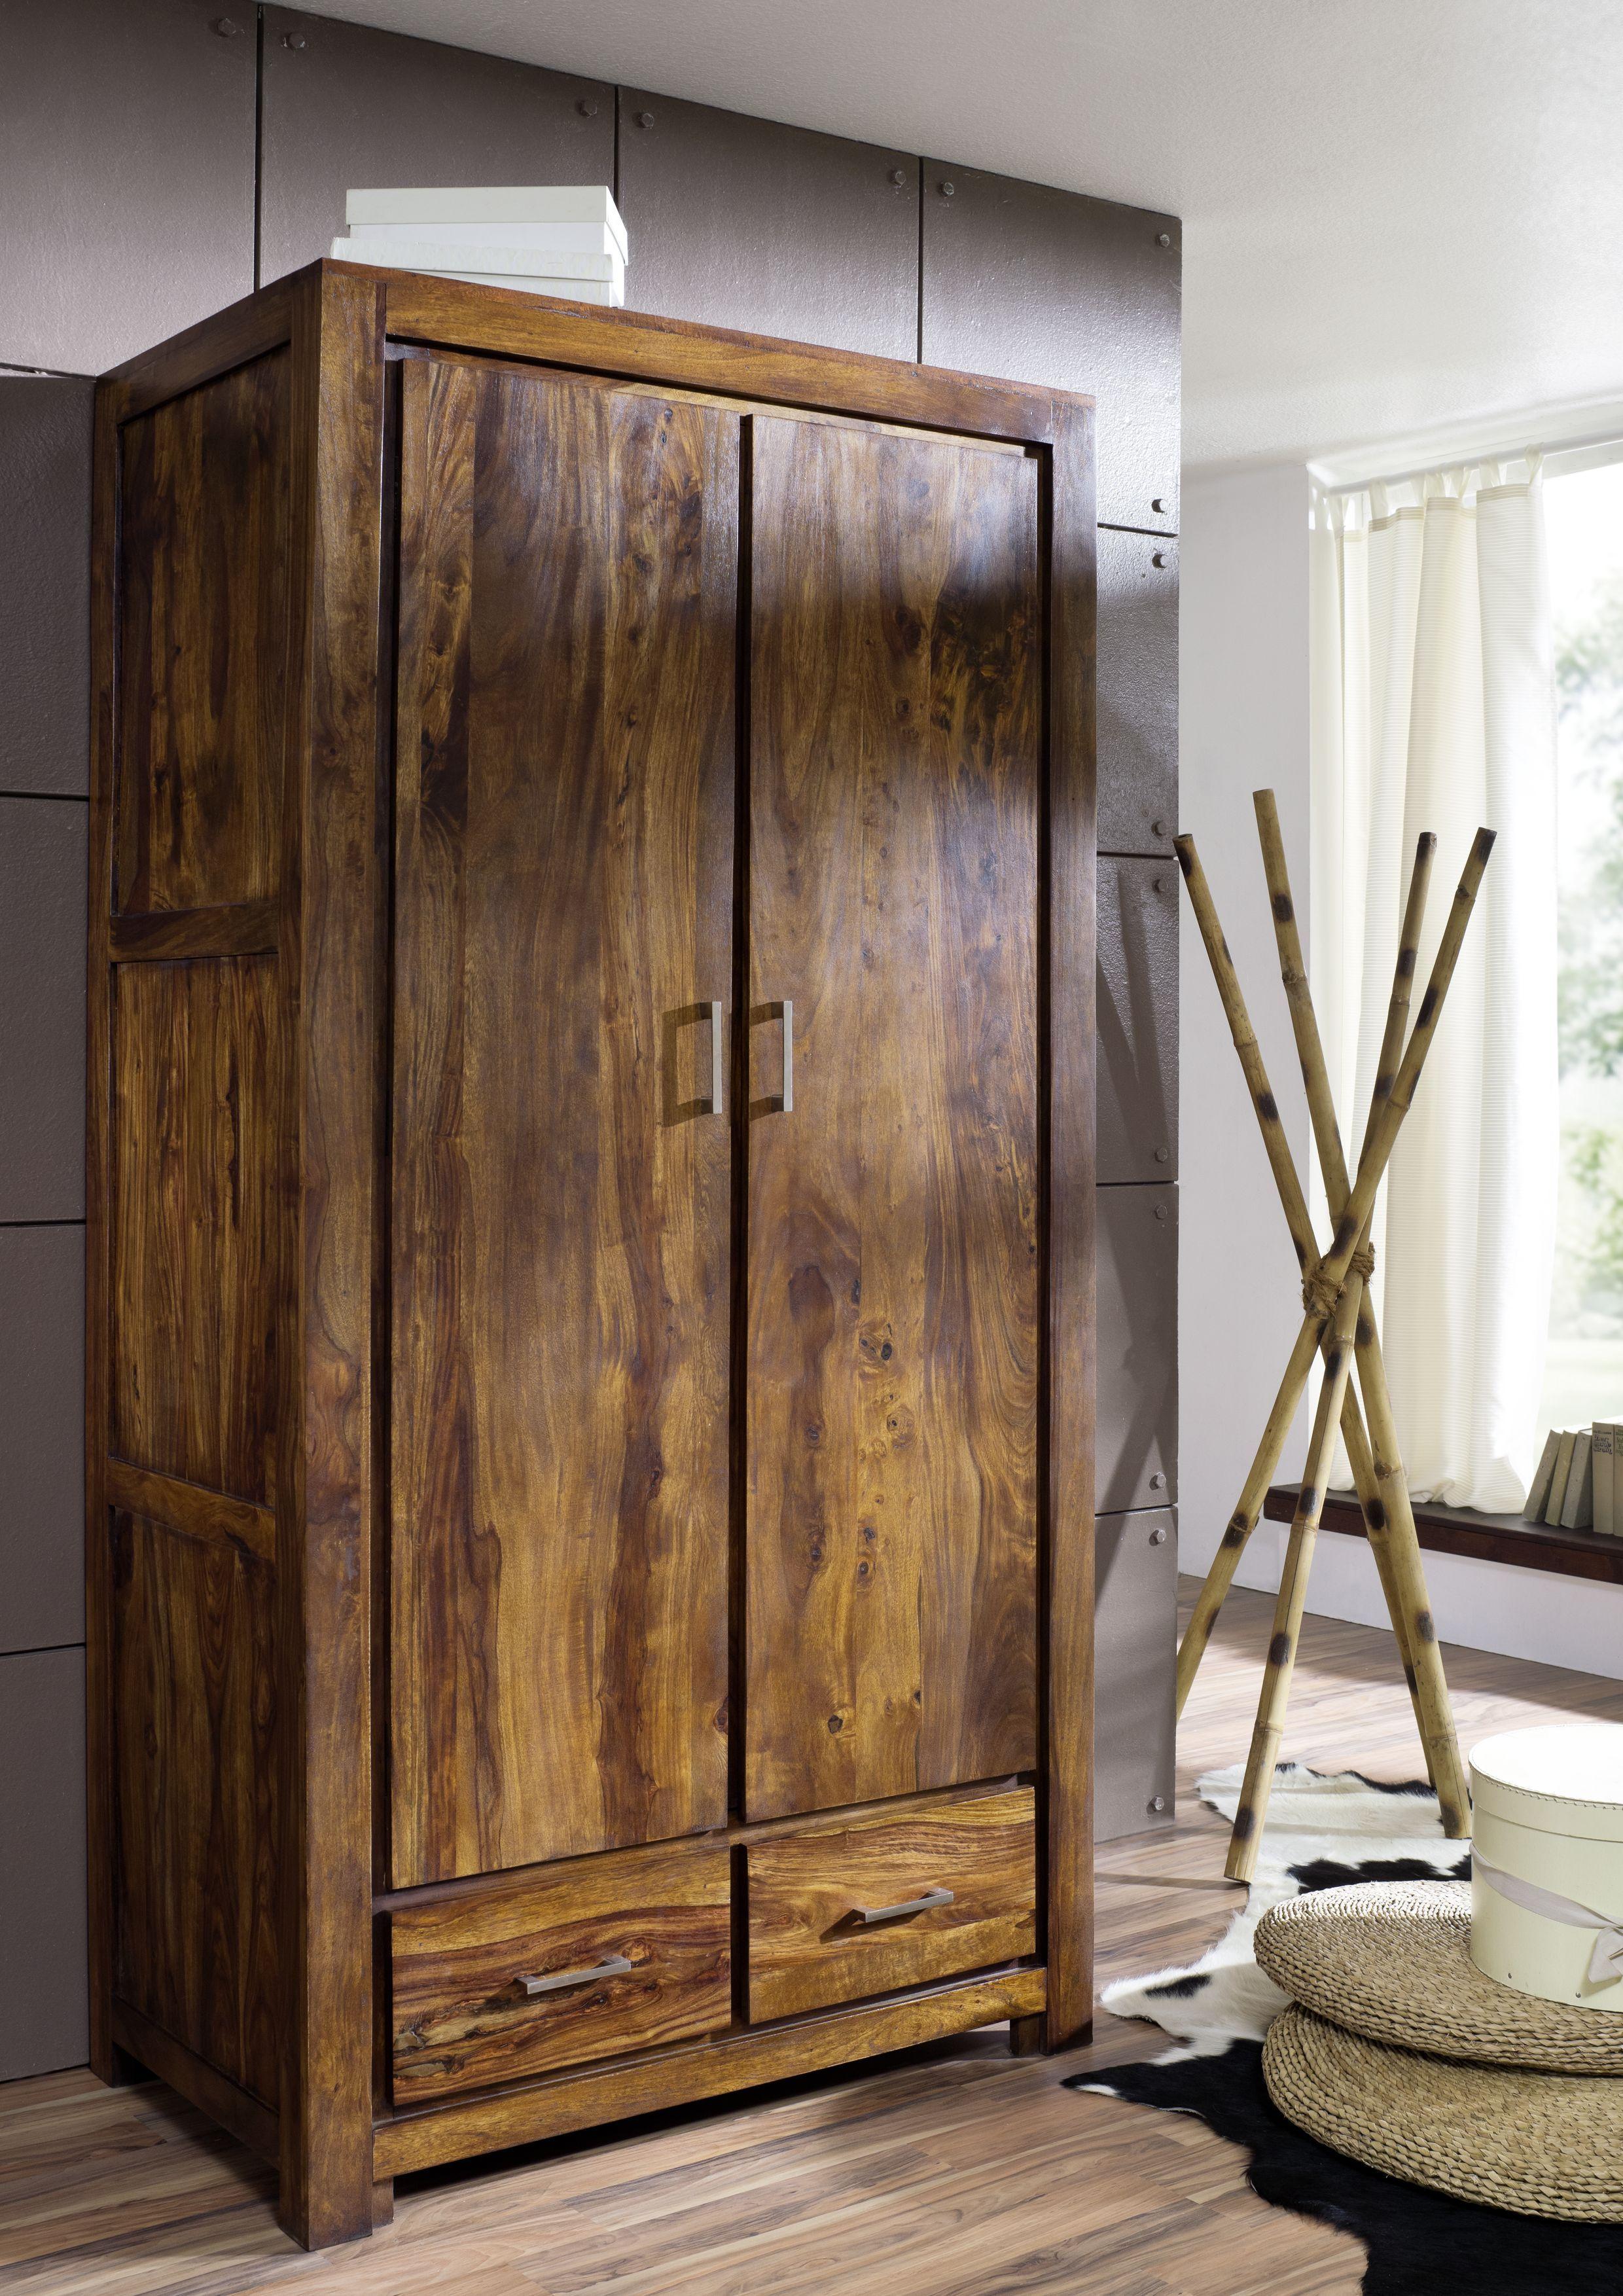 Möbel Palisander versandfrei kaufen Diseño de interiores